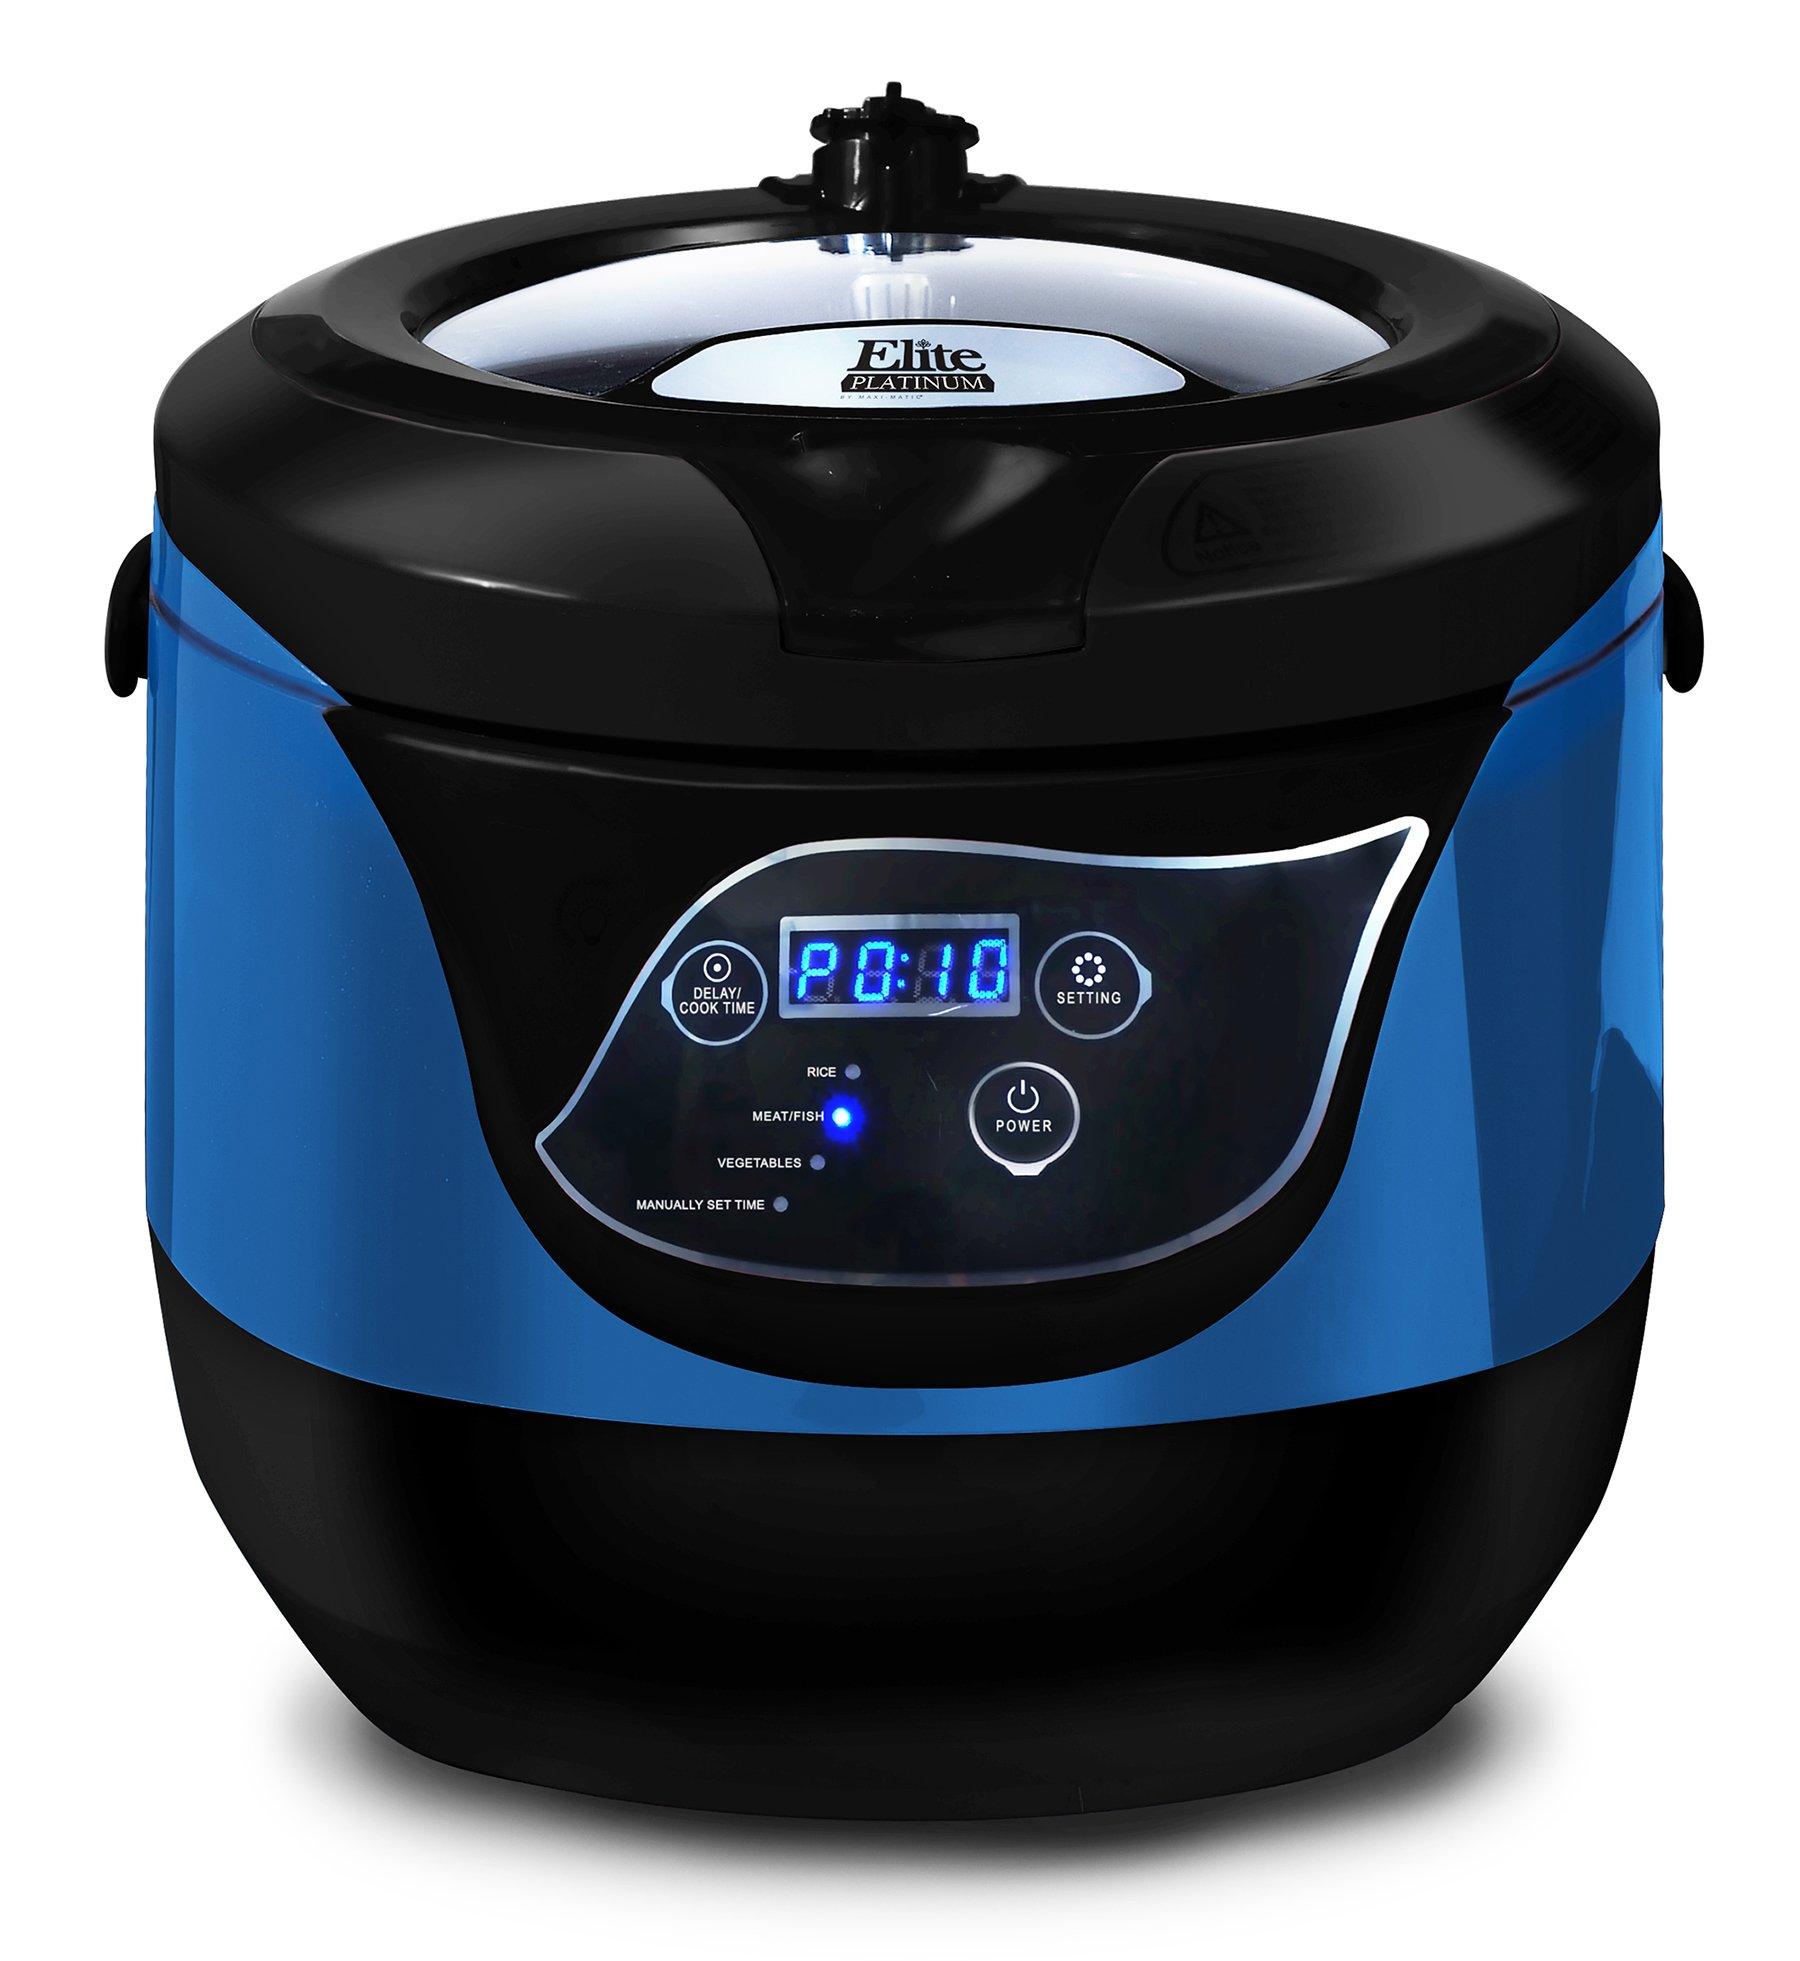 Elite Platinum EPCM-55BL Maxi-Matic 5.5 Quart Electric Digital Low Pressure Cooker, Blue